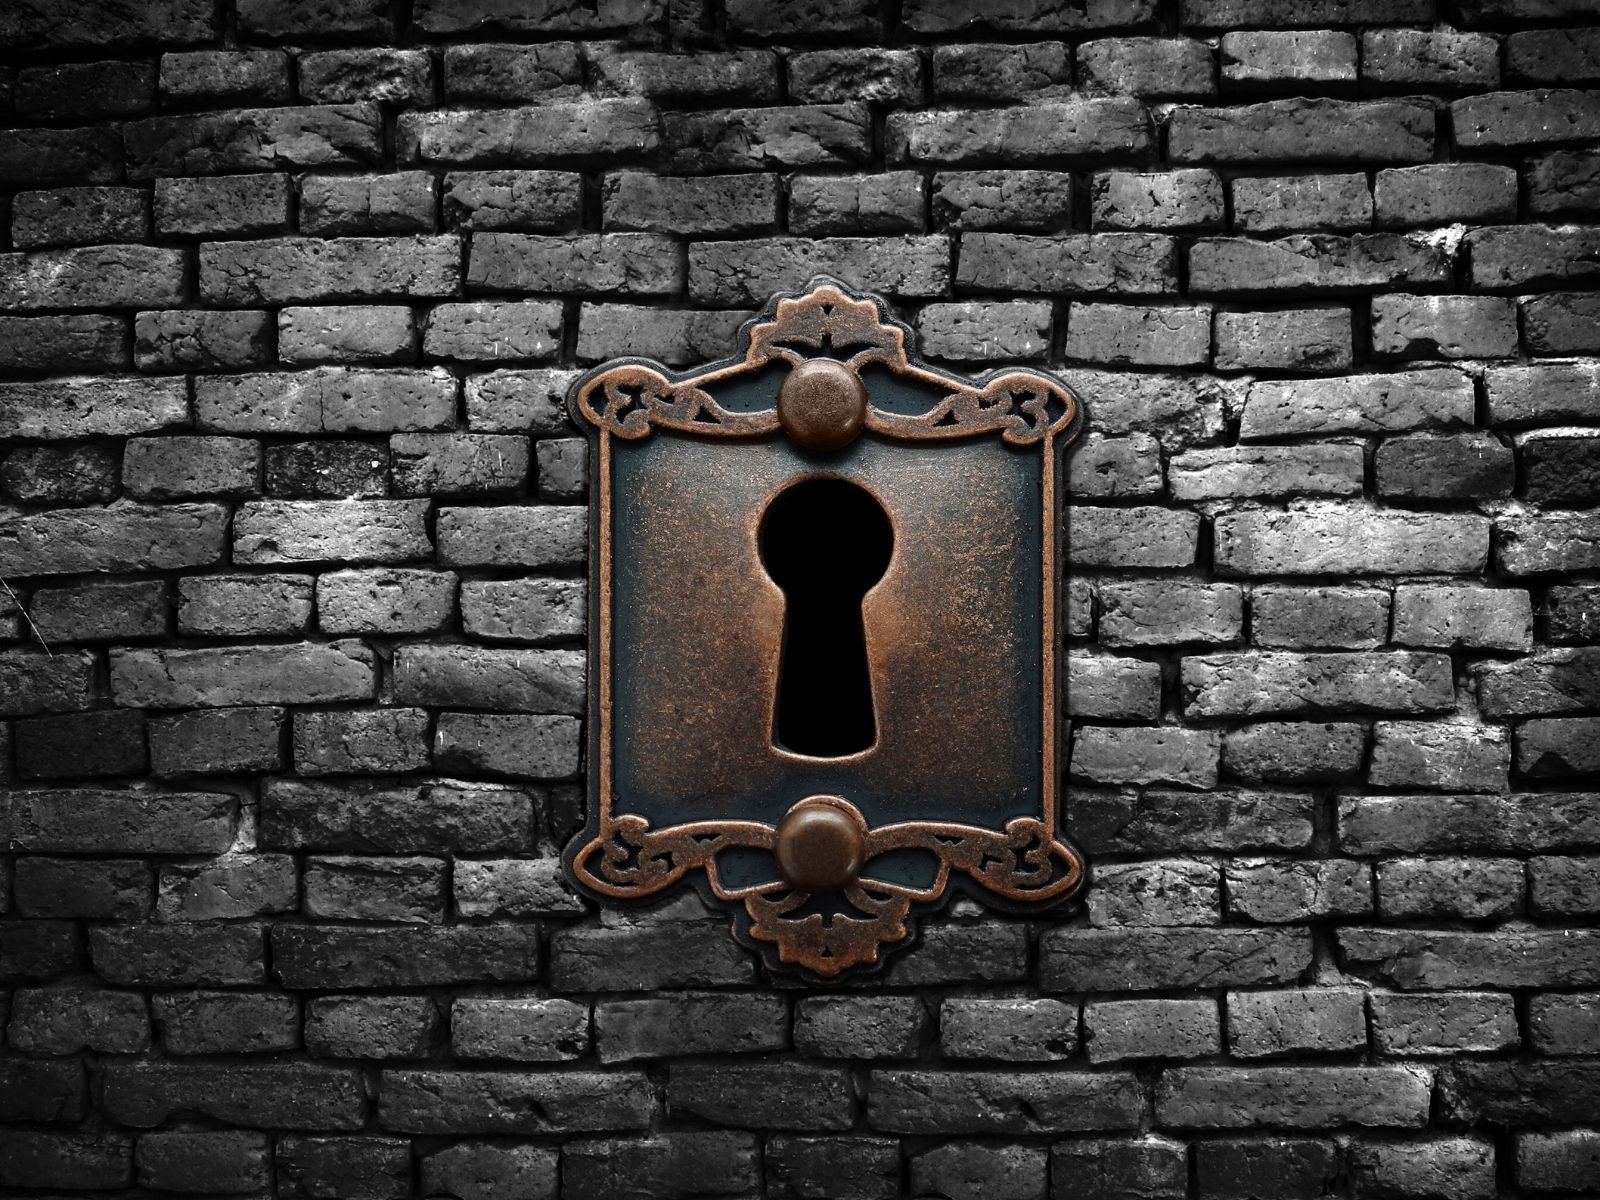 MyDomainisinsidethis closed wall